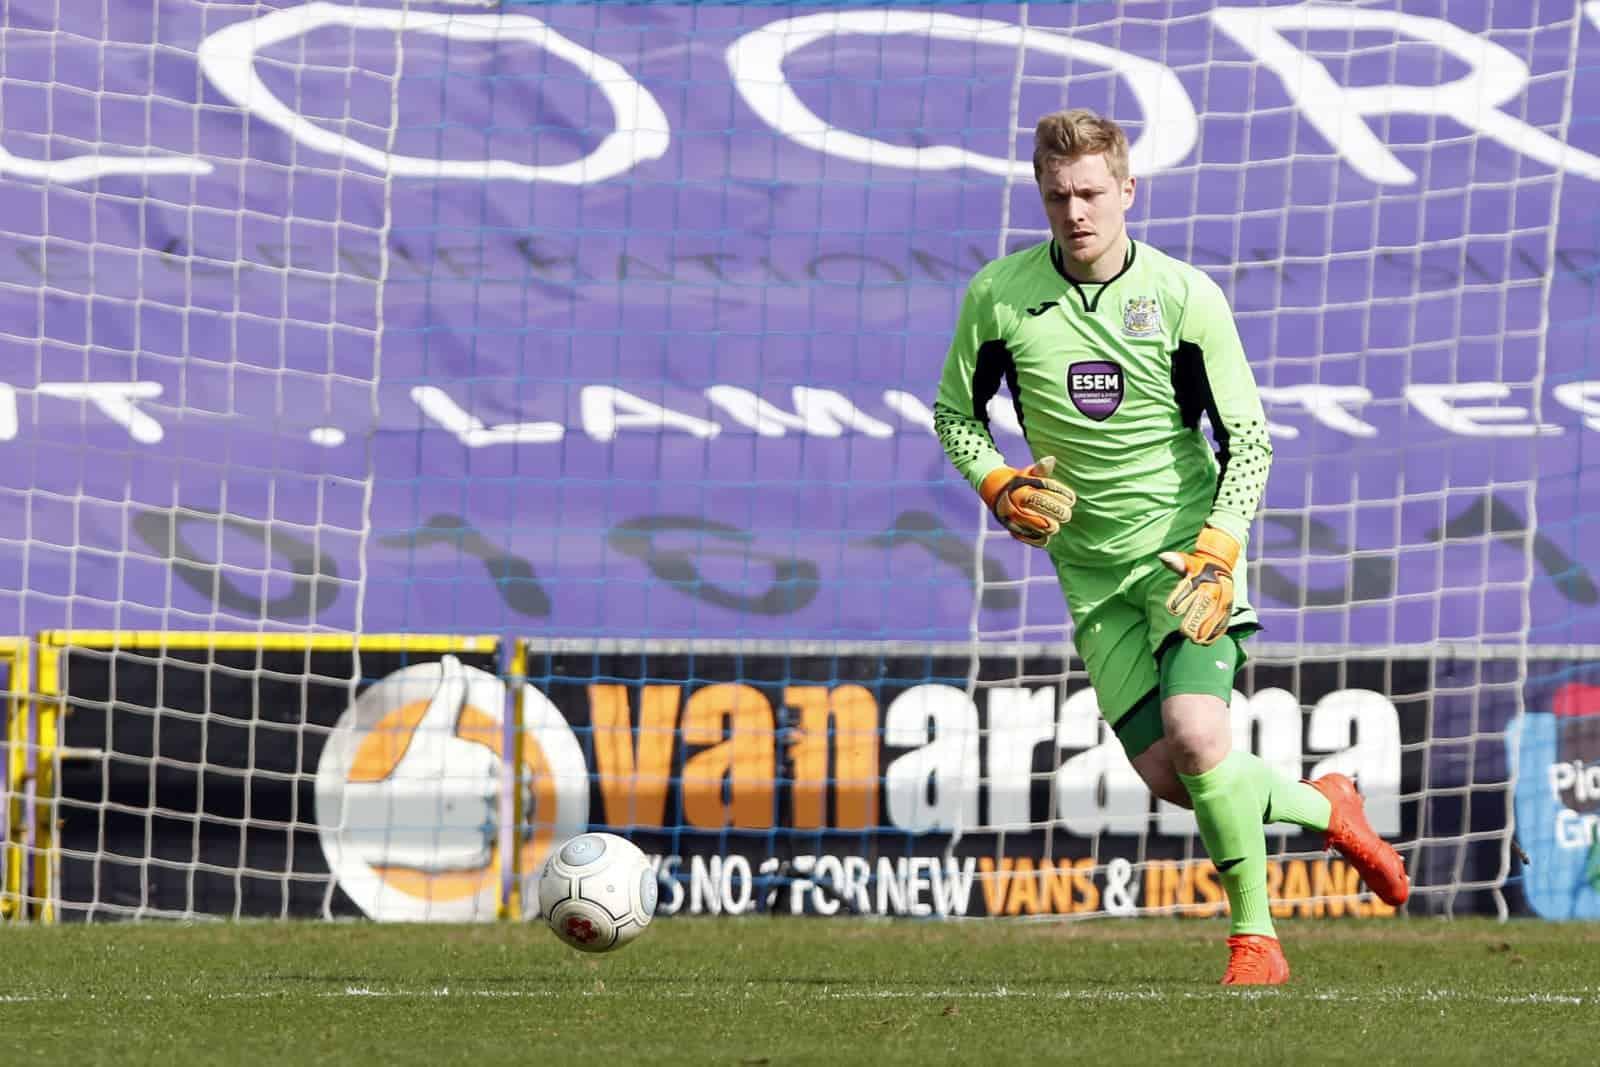 Ian Ormson, Stockport County 1-0 Telford, 14.4.18